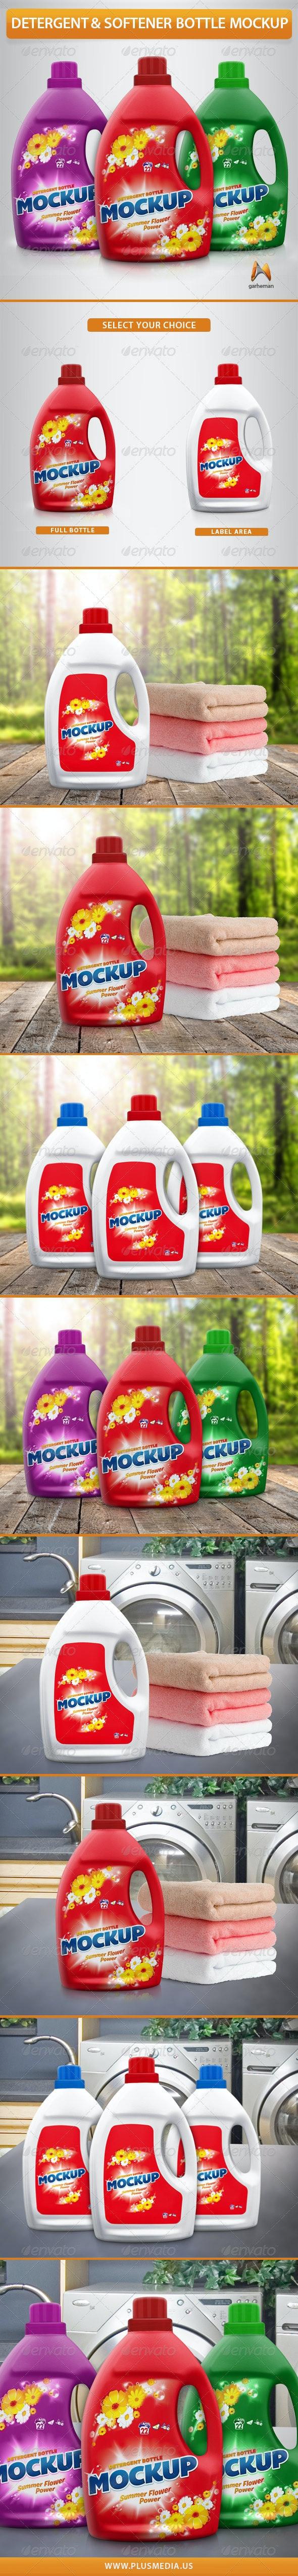 Detergent & Softener Bottle Mockup - Miscellaneous Packaging